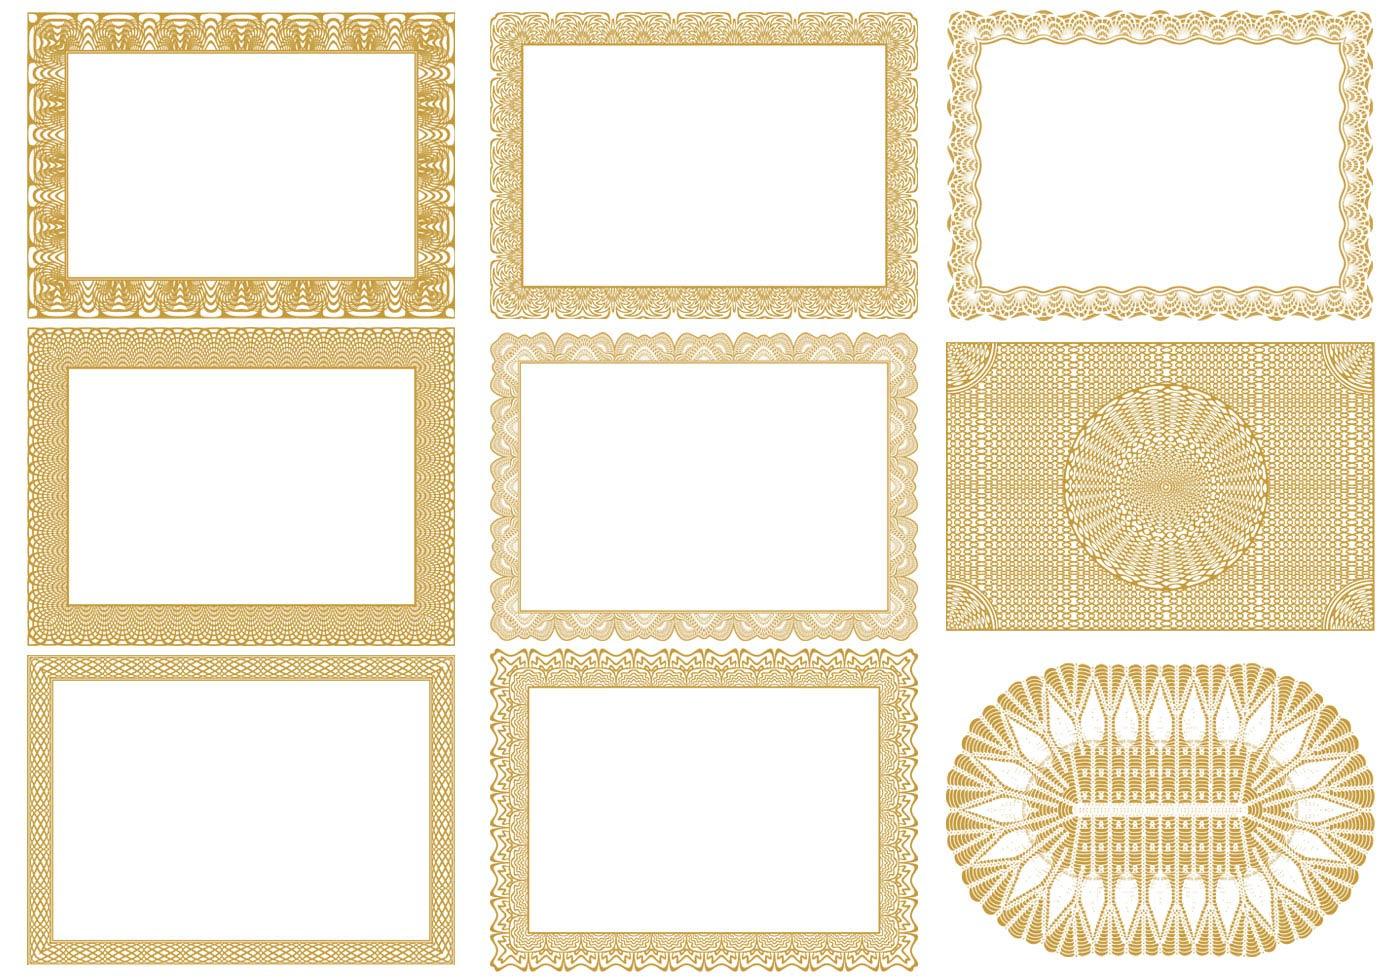 Certificate border vectors pack download free vector art stock graphics images for Certificate border vector